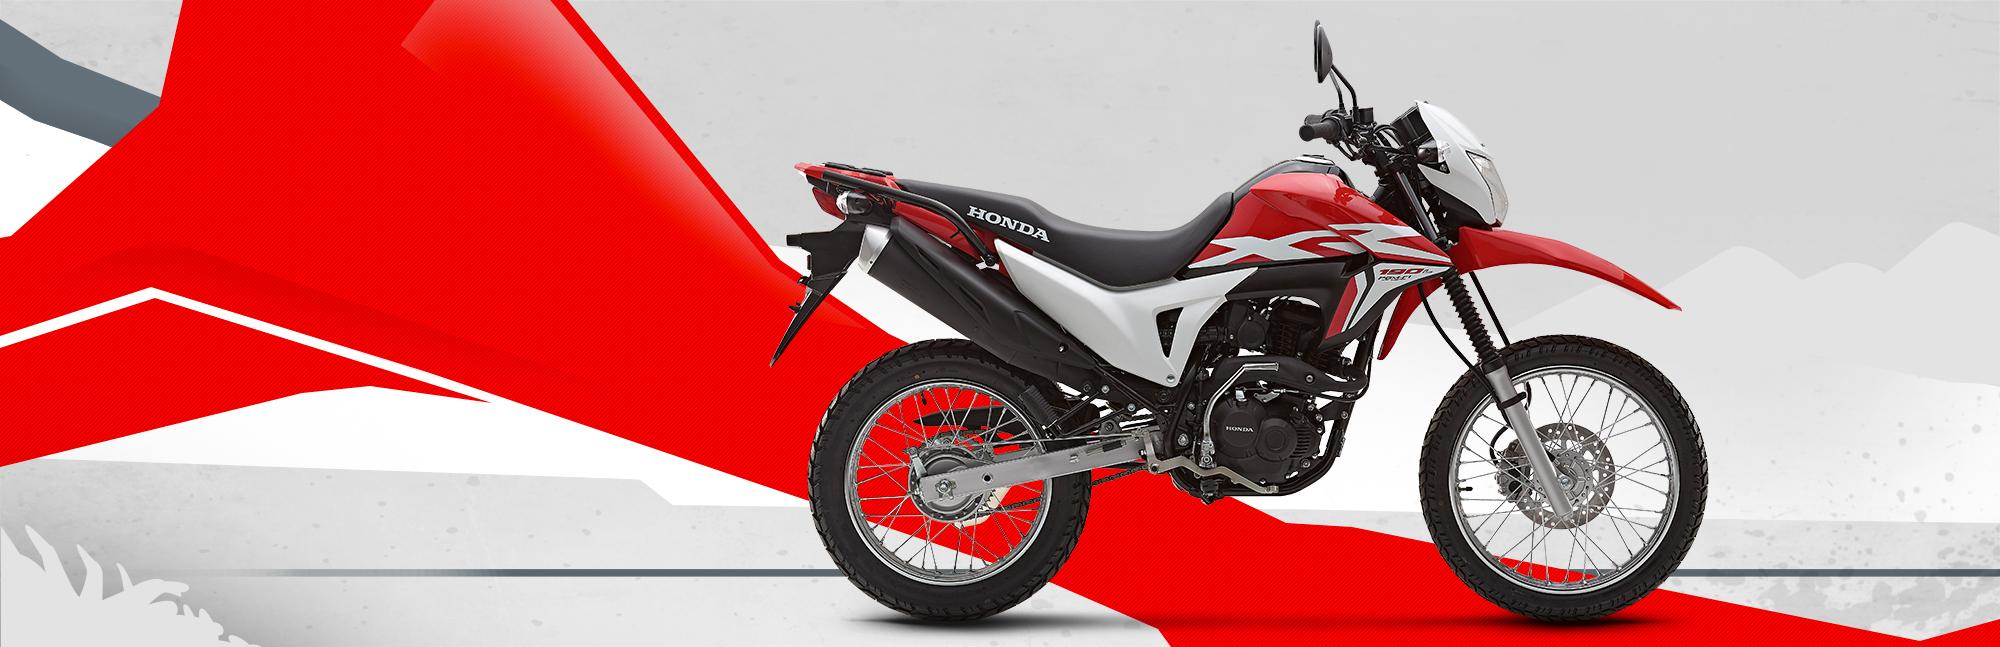 Motos Honda Costa Rica | XR190L - Motos Honda Costa Rica